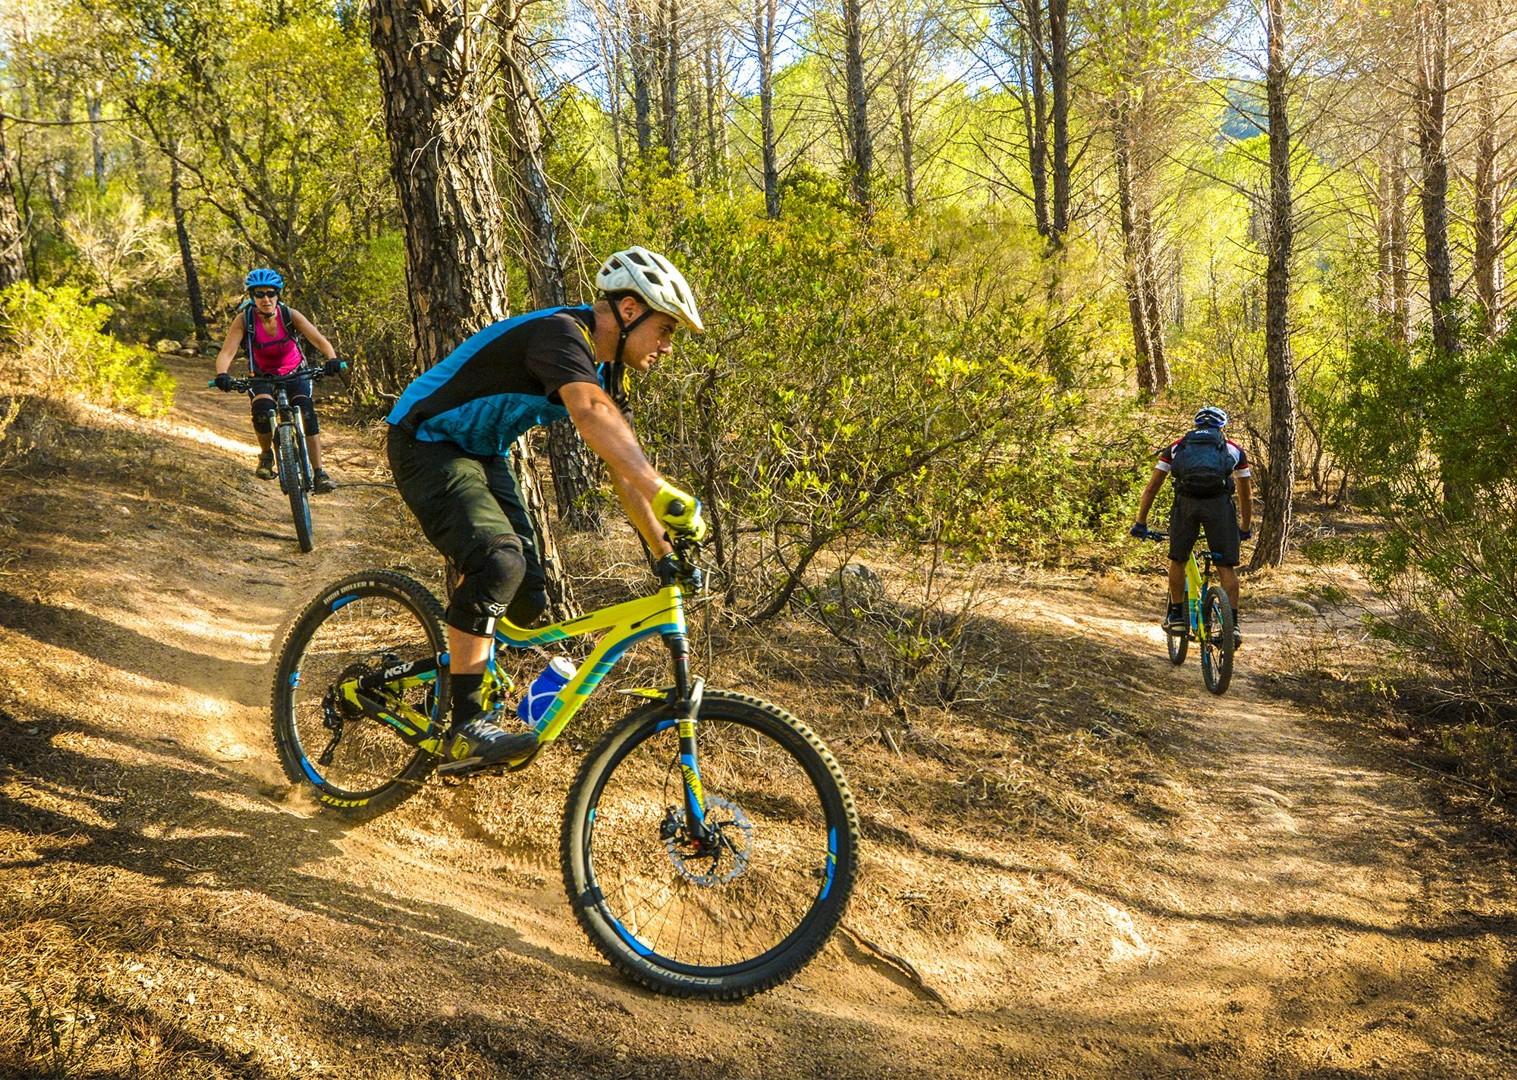 hills-of-marmilla-sardinia-technical-mountain-biking-holiday-italy.jpg - Sardinia - Coast to Coast - Italia Mountain Biking